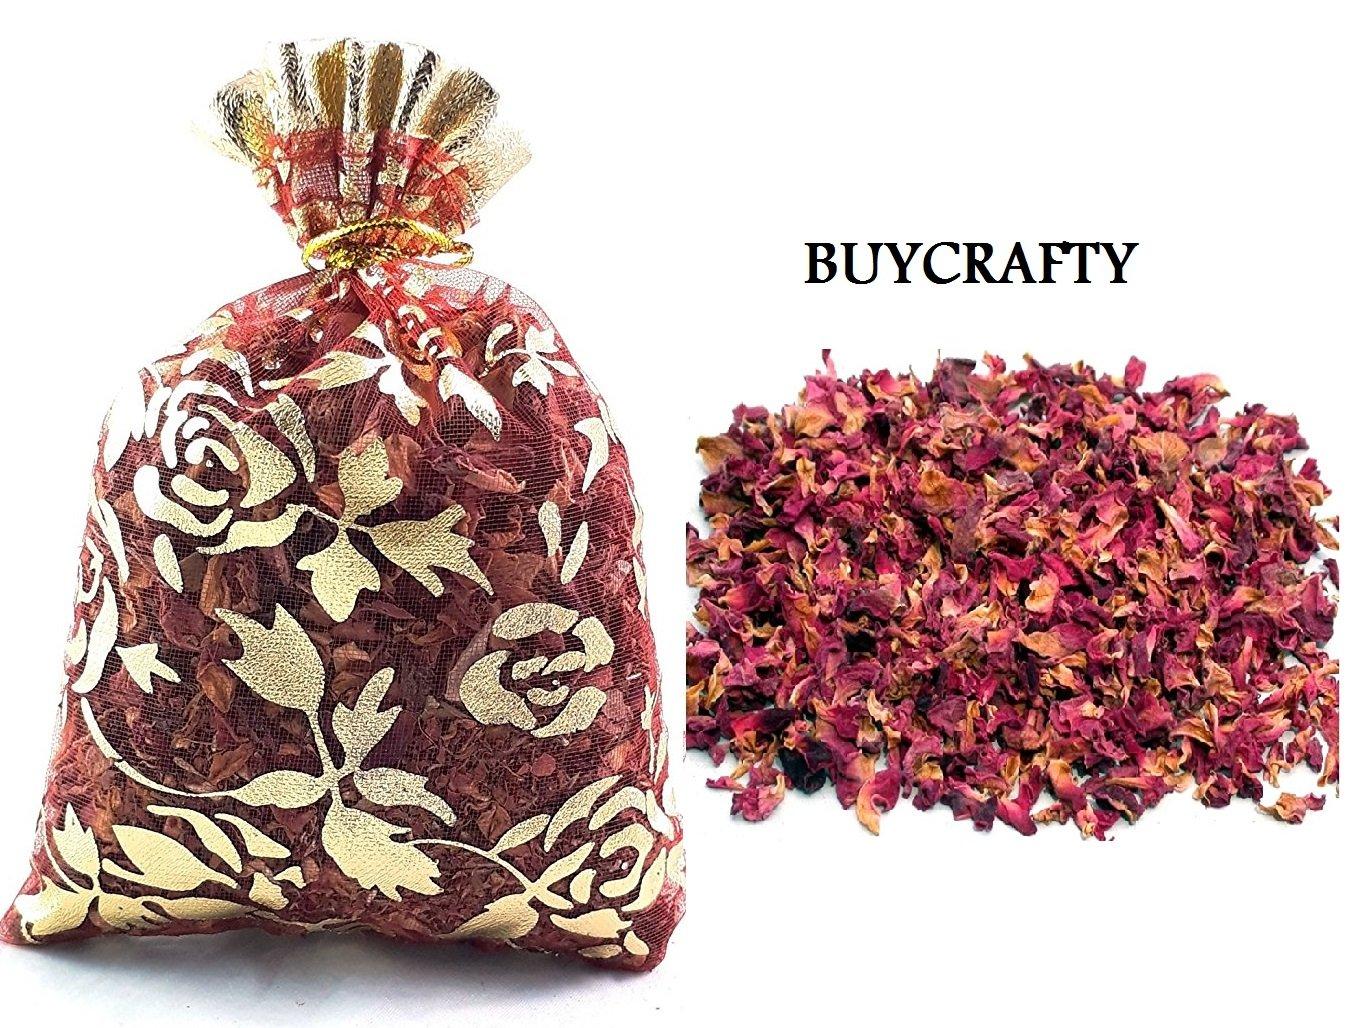 Buycrafty 20g DRIED ROSE PETALS Bag Tea Potpourri Wedding Decor Organic Herbal Craft Car Perfume